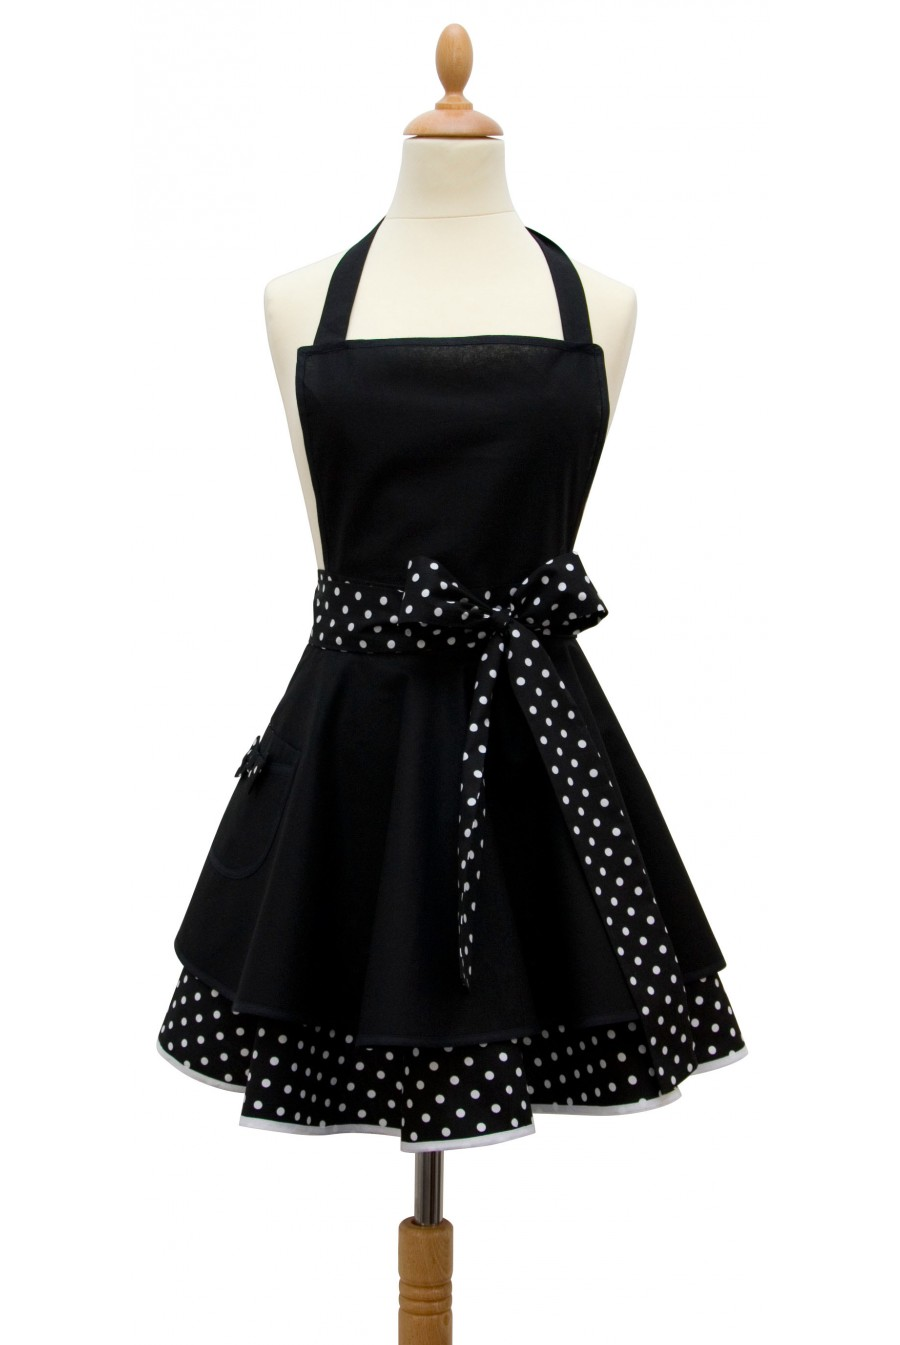 madam choup les cooking dress glamour. Black Bedroom Furniture Sets. Home Design Ideas